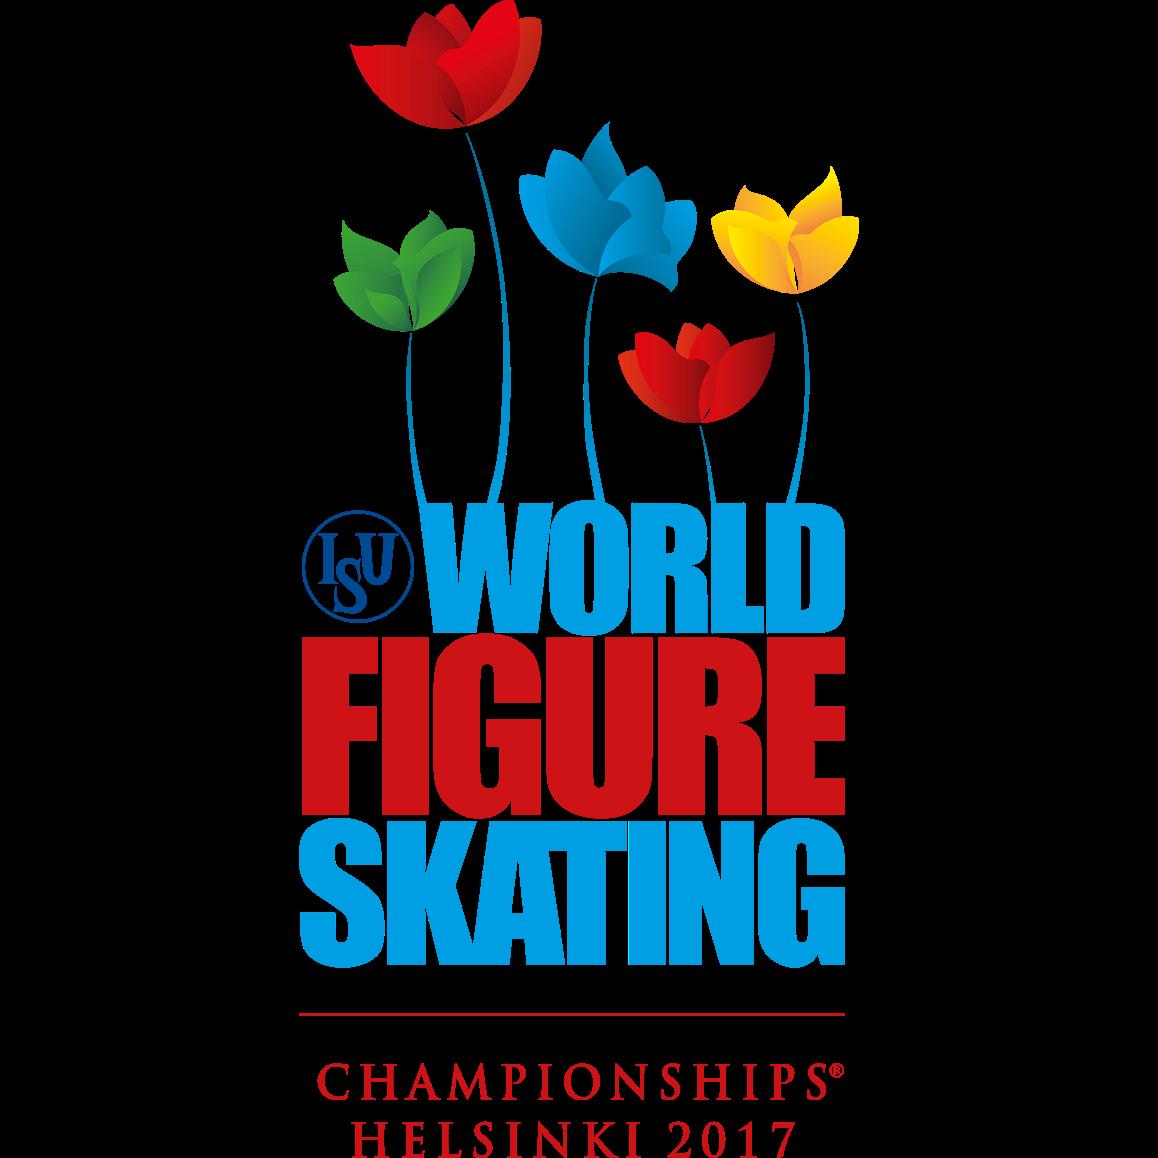 2017 World Figure Skating Championships